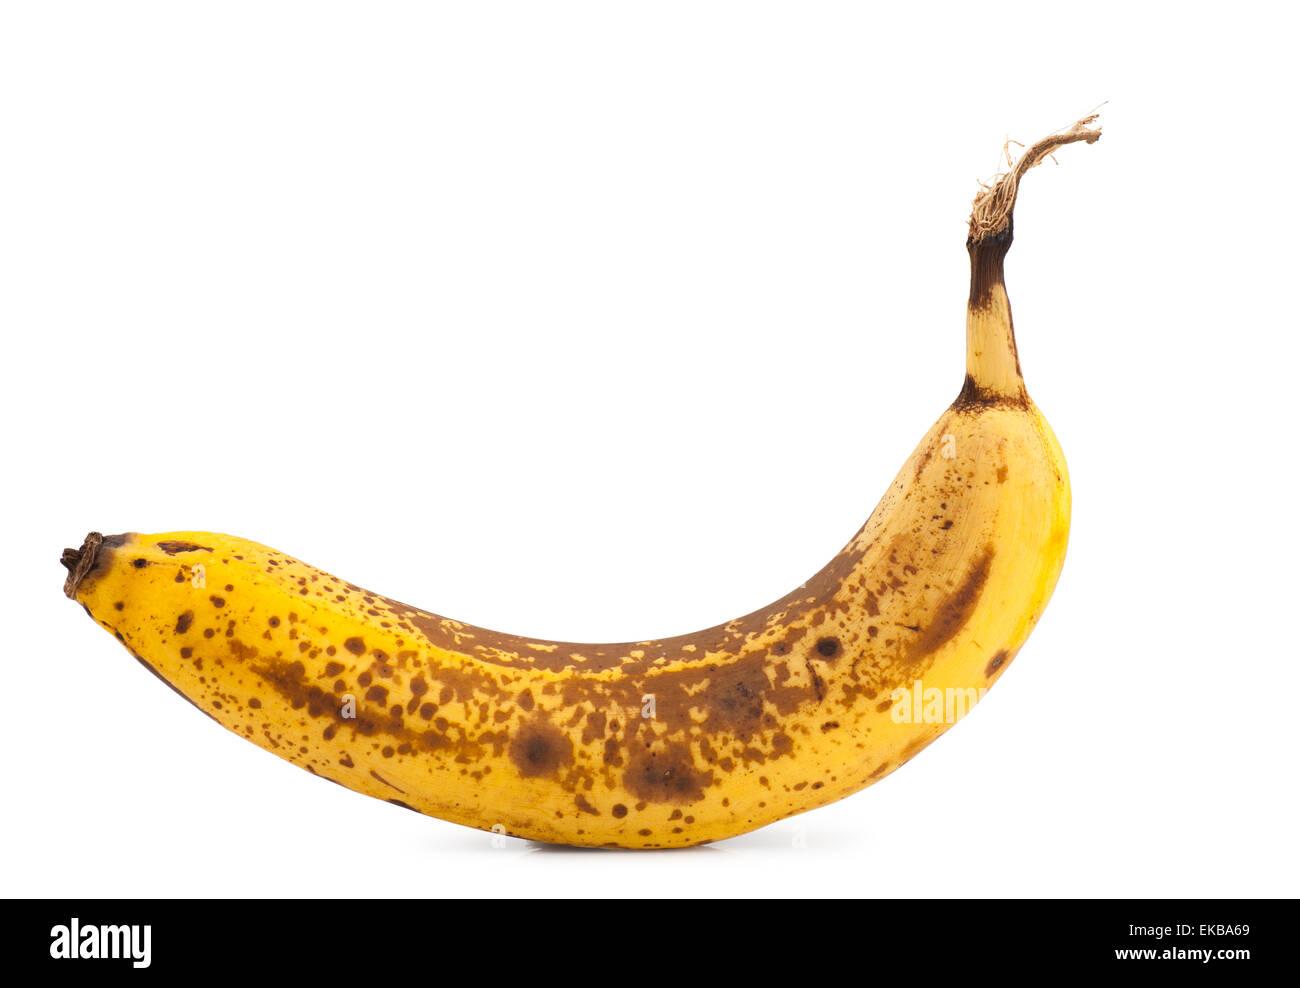 Overripe banana - Stock Image